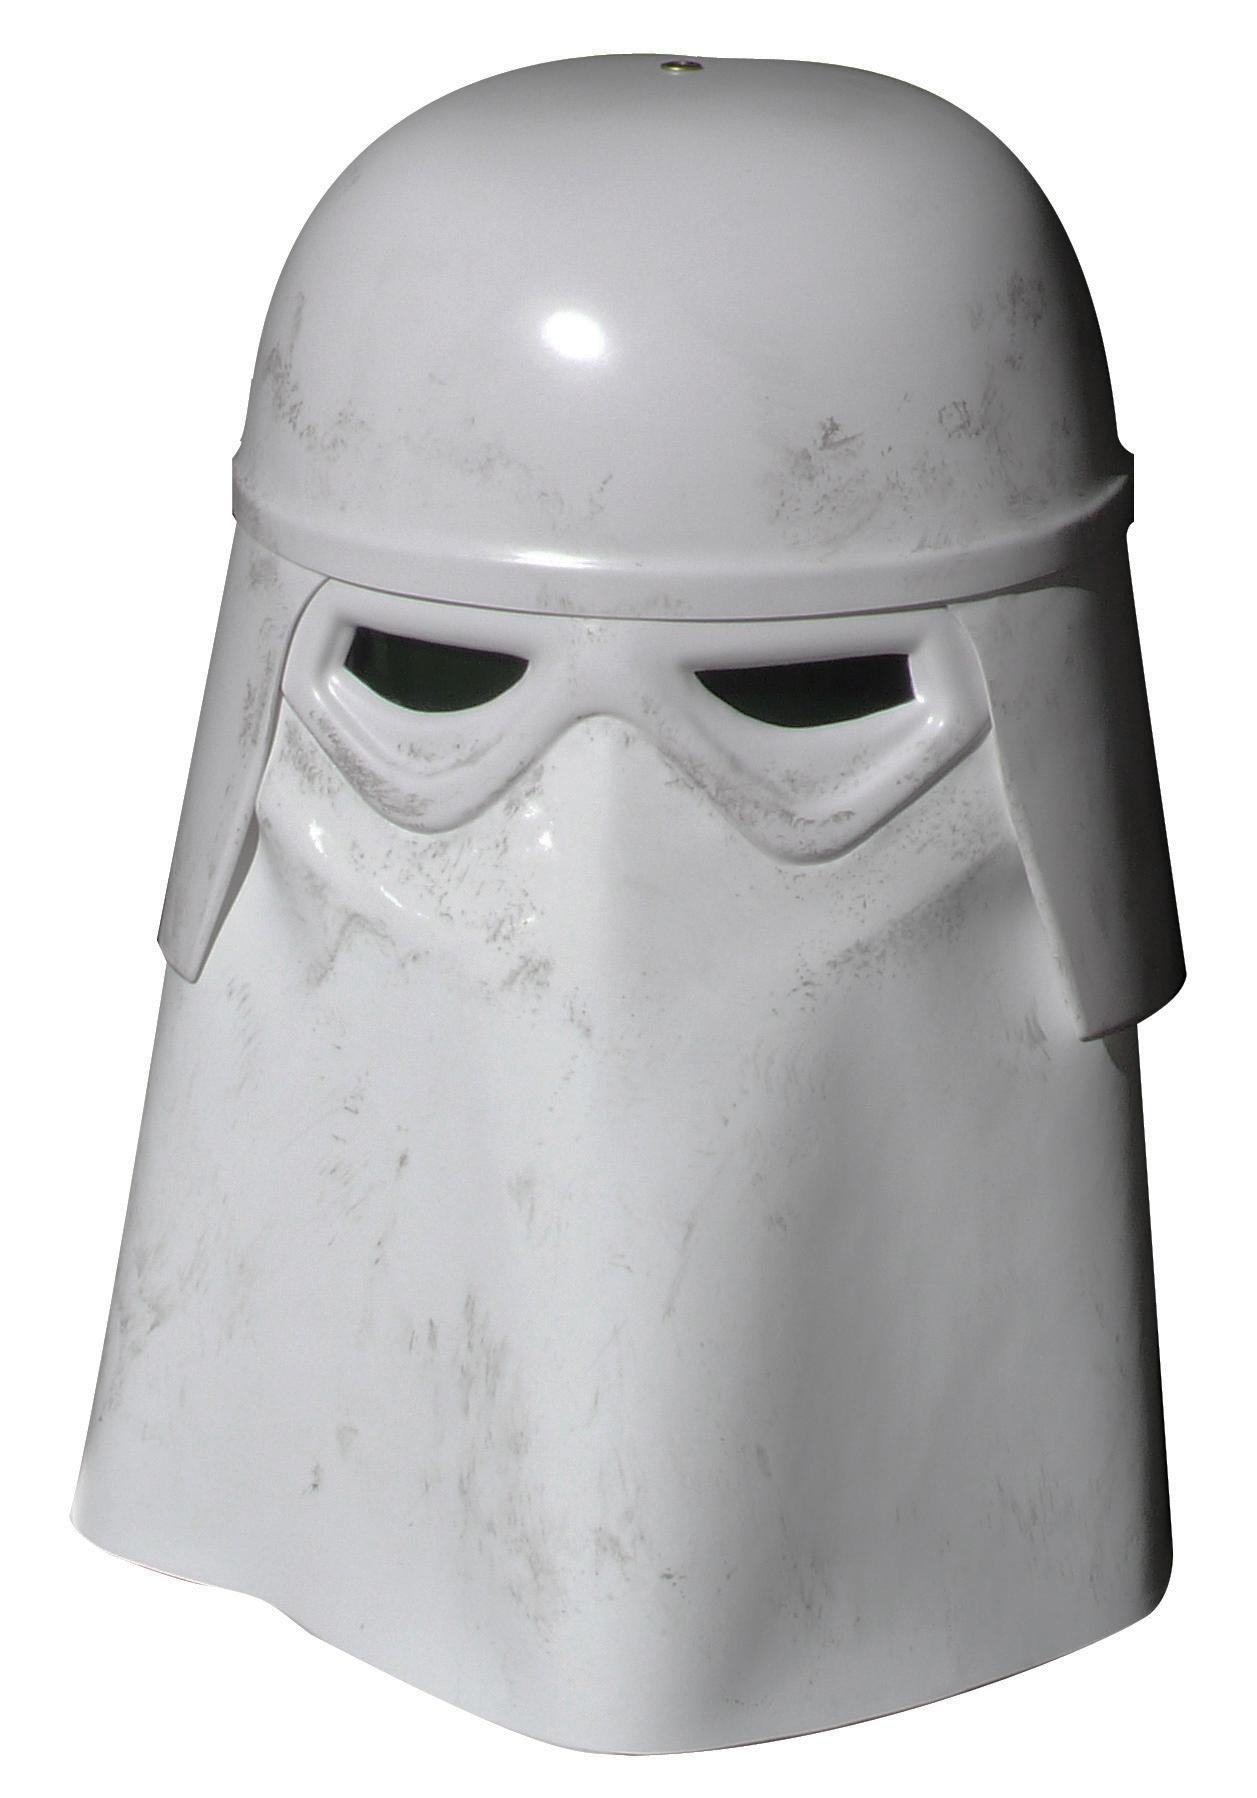 www.501st.com/mw501/images/5/57/TS_helmet.jpg